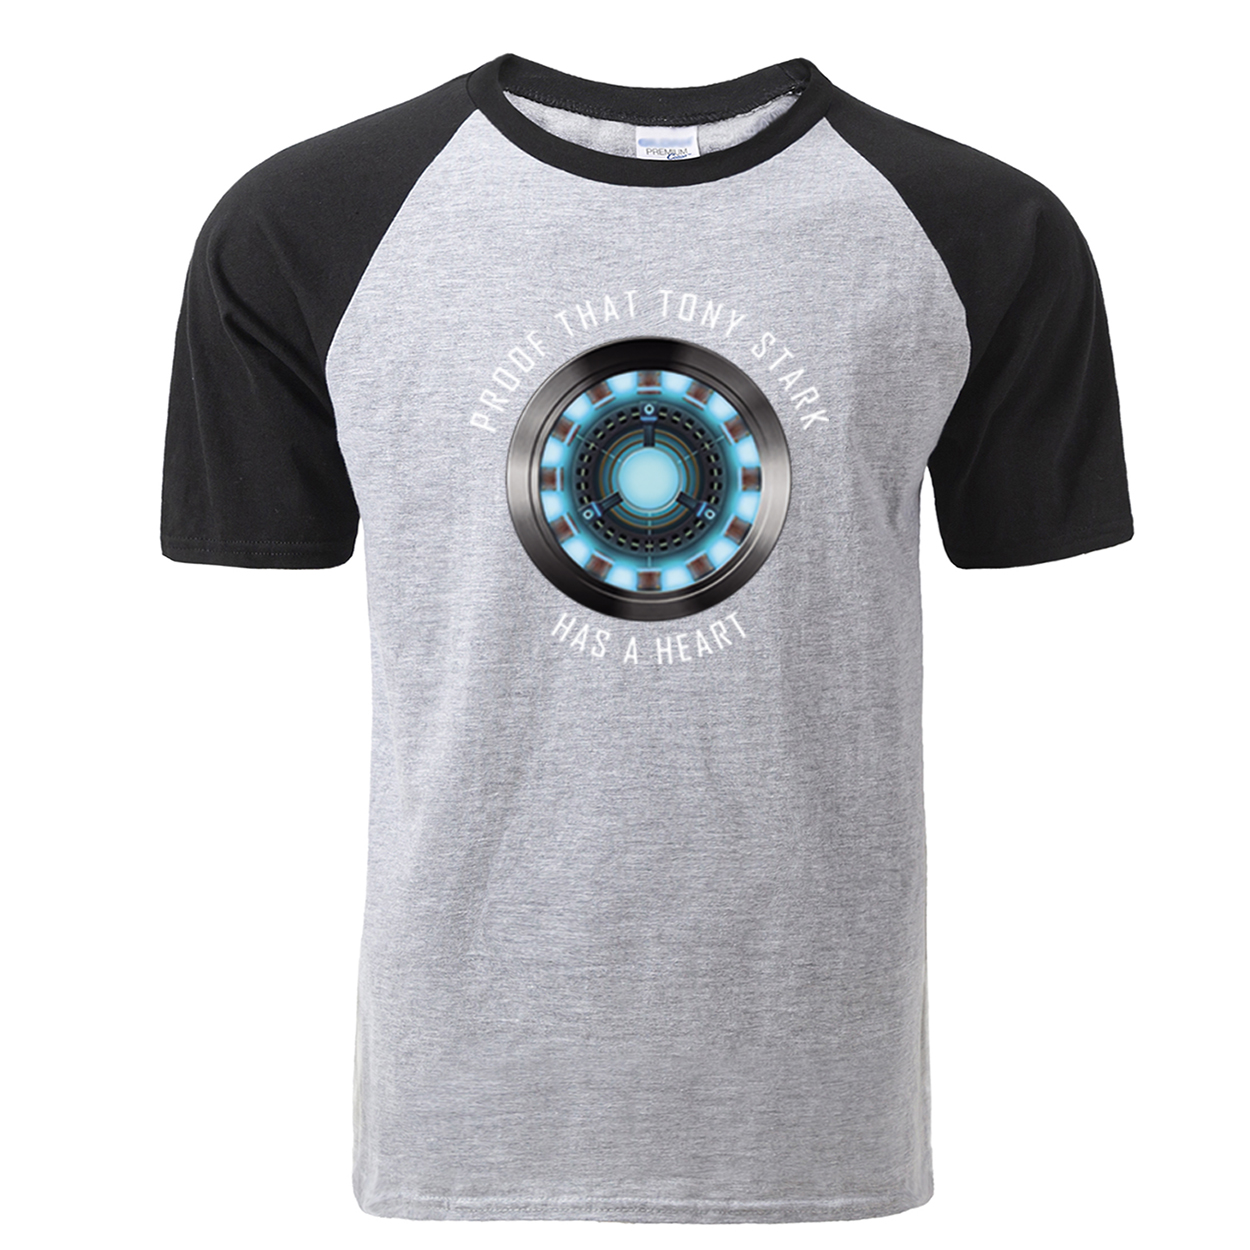 Fashion Tony Stark Tshirt Marvel Iron Man T Shirt Men Avengers Anime Summer Raglan Tshirt Streetwear Tops T Shirt Homme Clothing